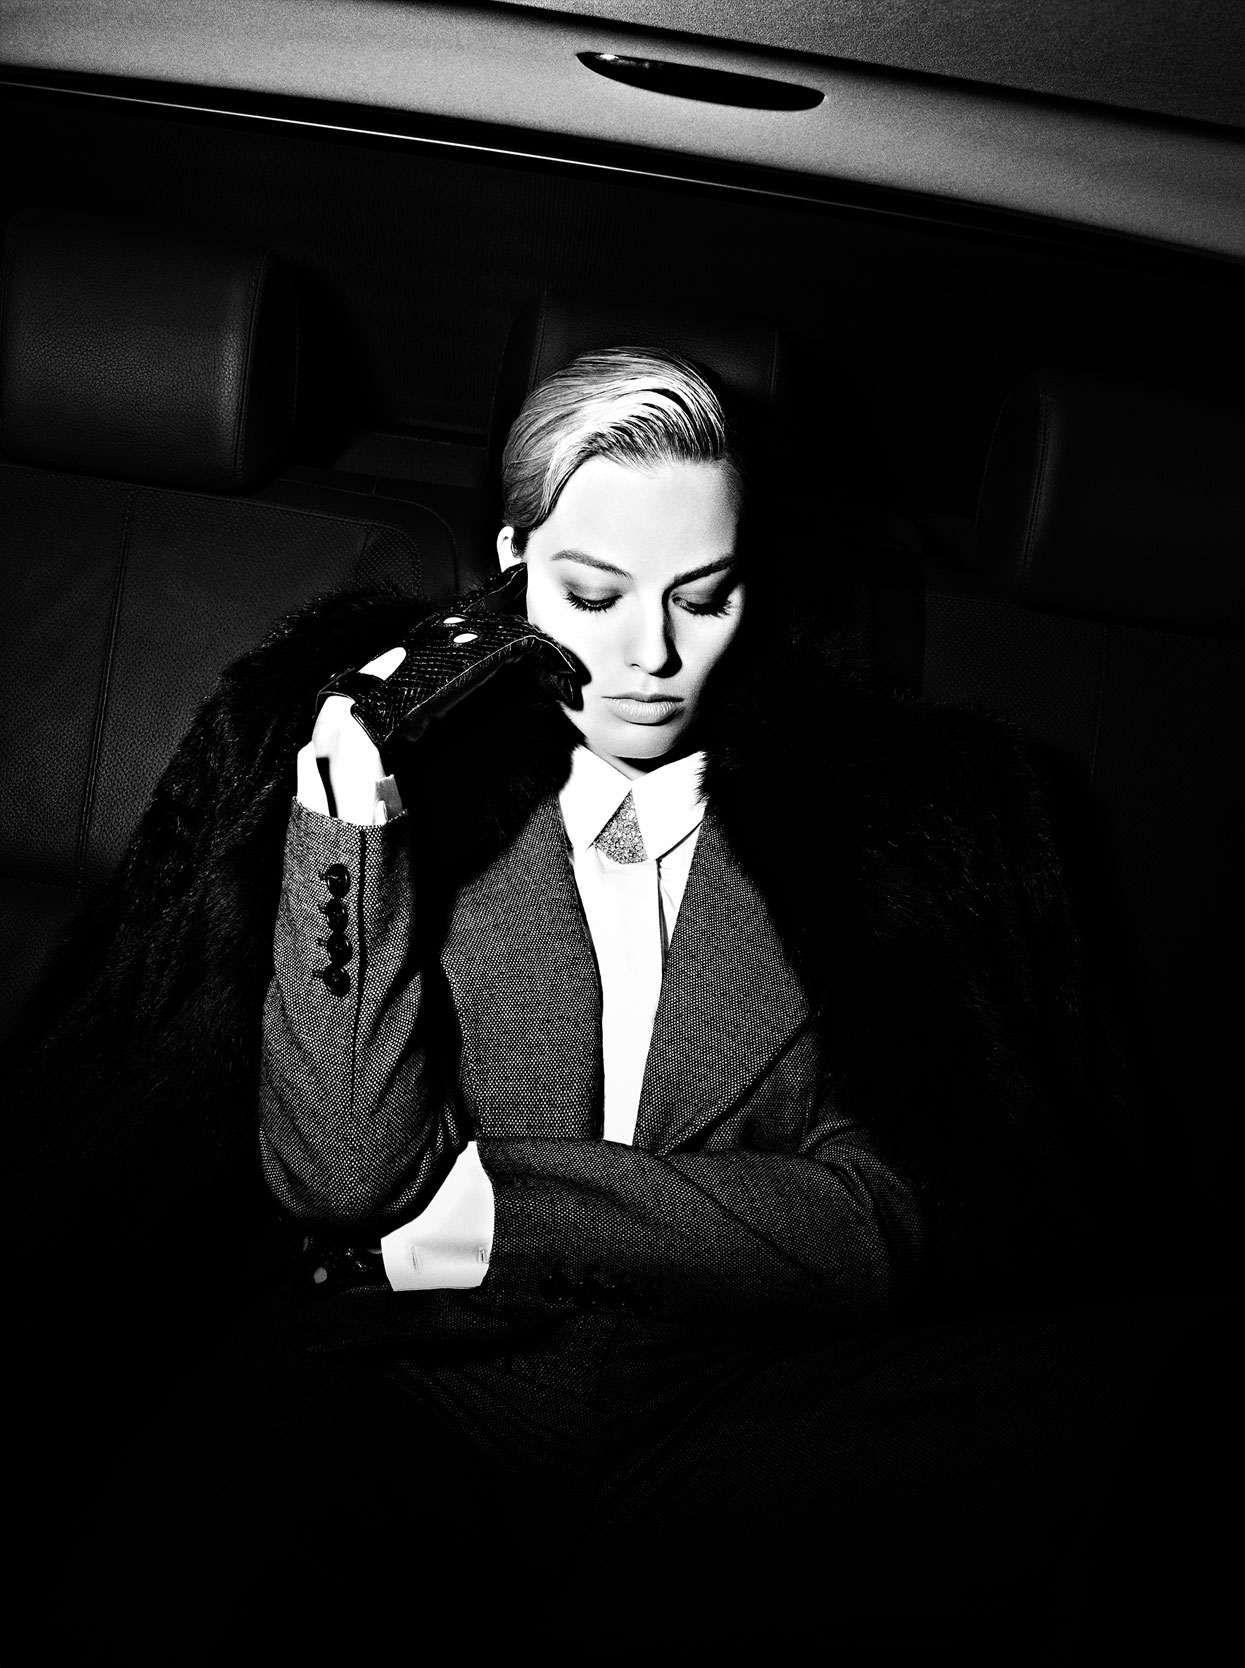 Black leather gloves brisbane - Celebrities In Gloves Margot Robbie Wearing Black Leather Gloves